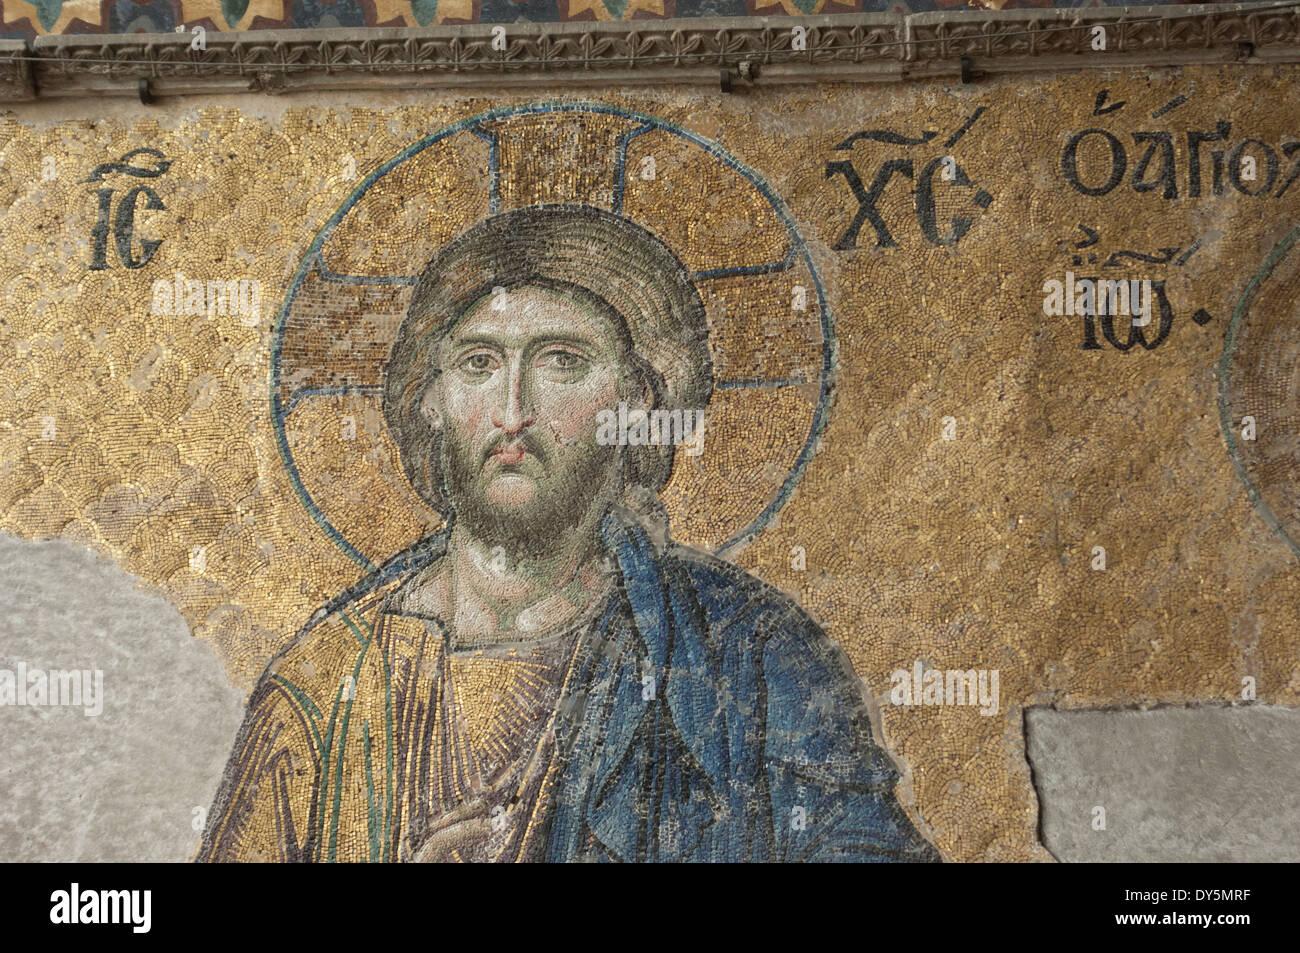 Byzantinisches Mosaik Jesu in der Hagia Sophia, Istanbul. Digitale Fotografie Stockbild